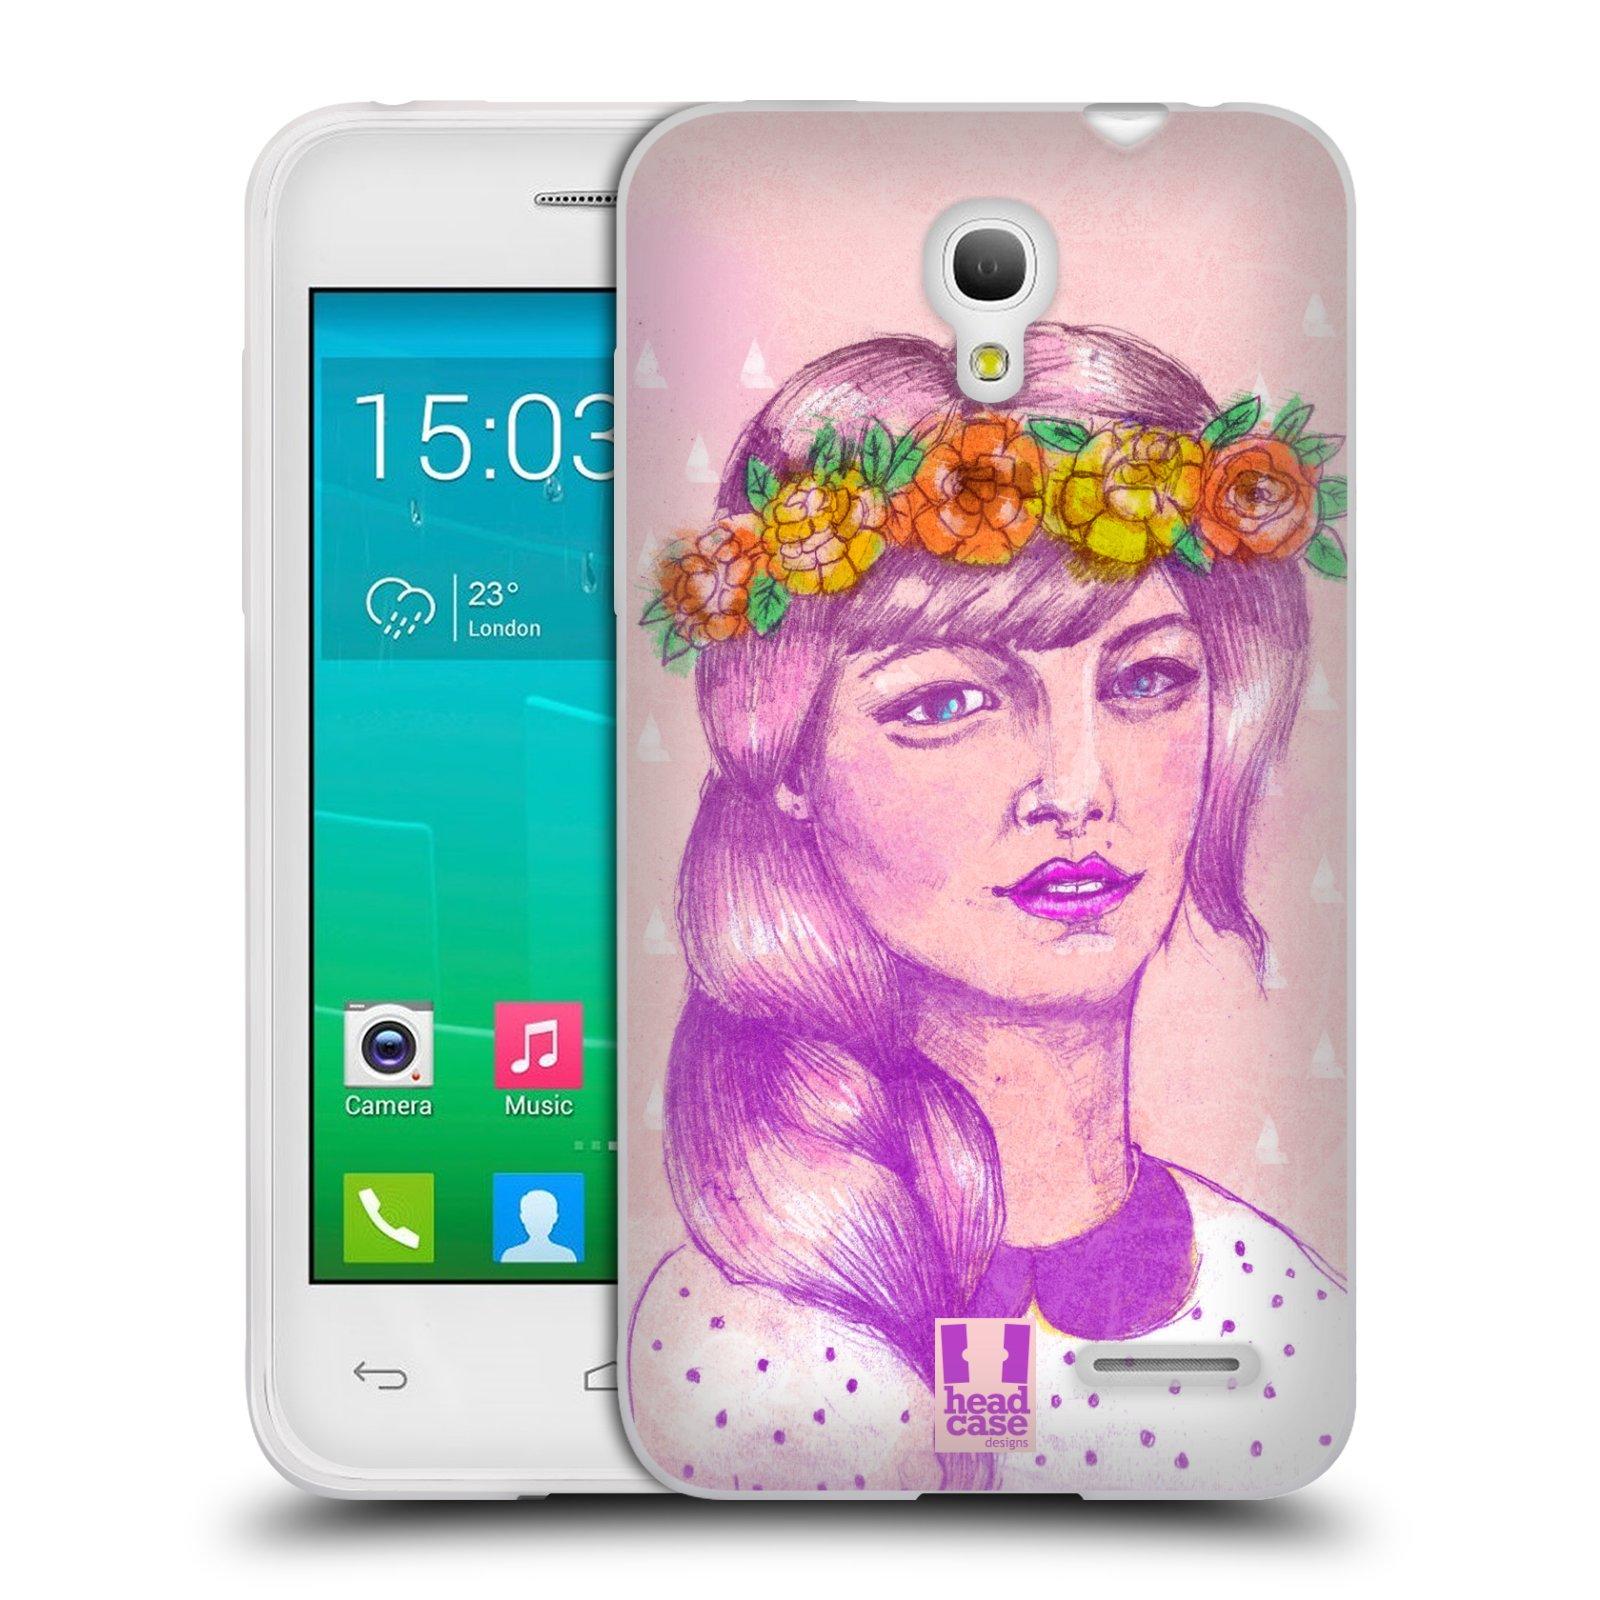 HEAD CASE silikonový obal na mobil Alcatel POP S3 OT-5050Y vzor Dívka dlouhé květinové vlasy KRÁSA